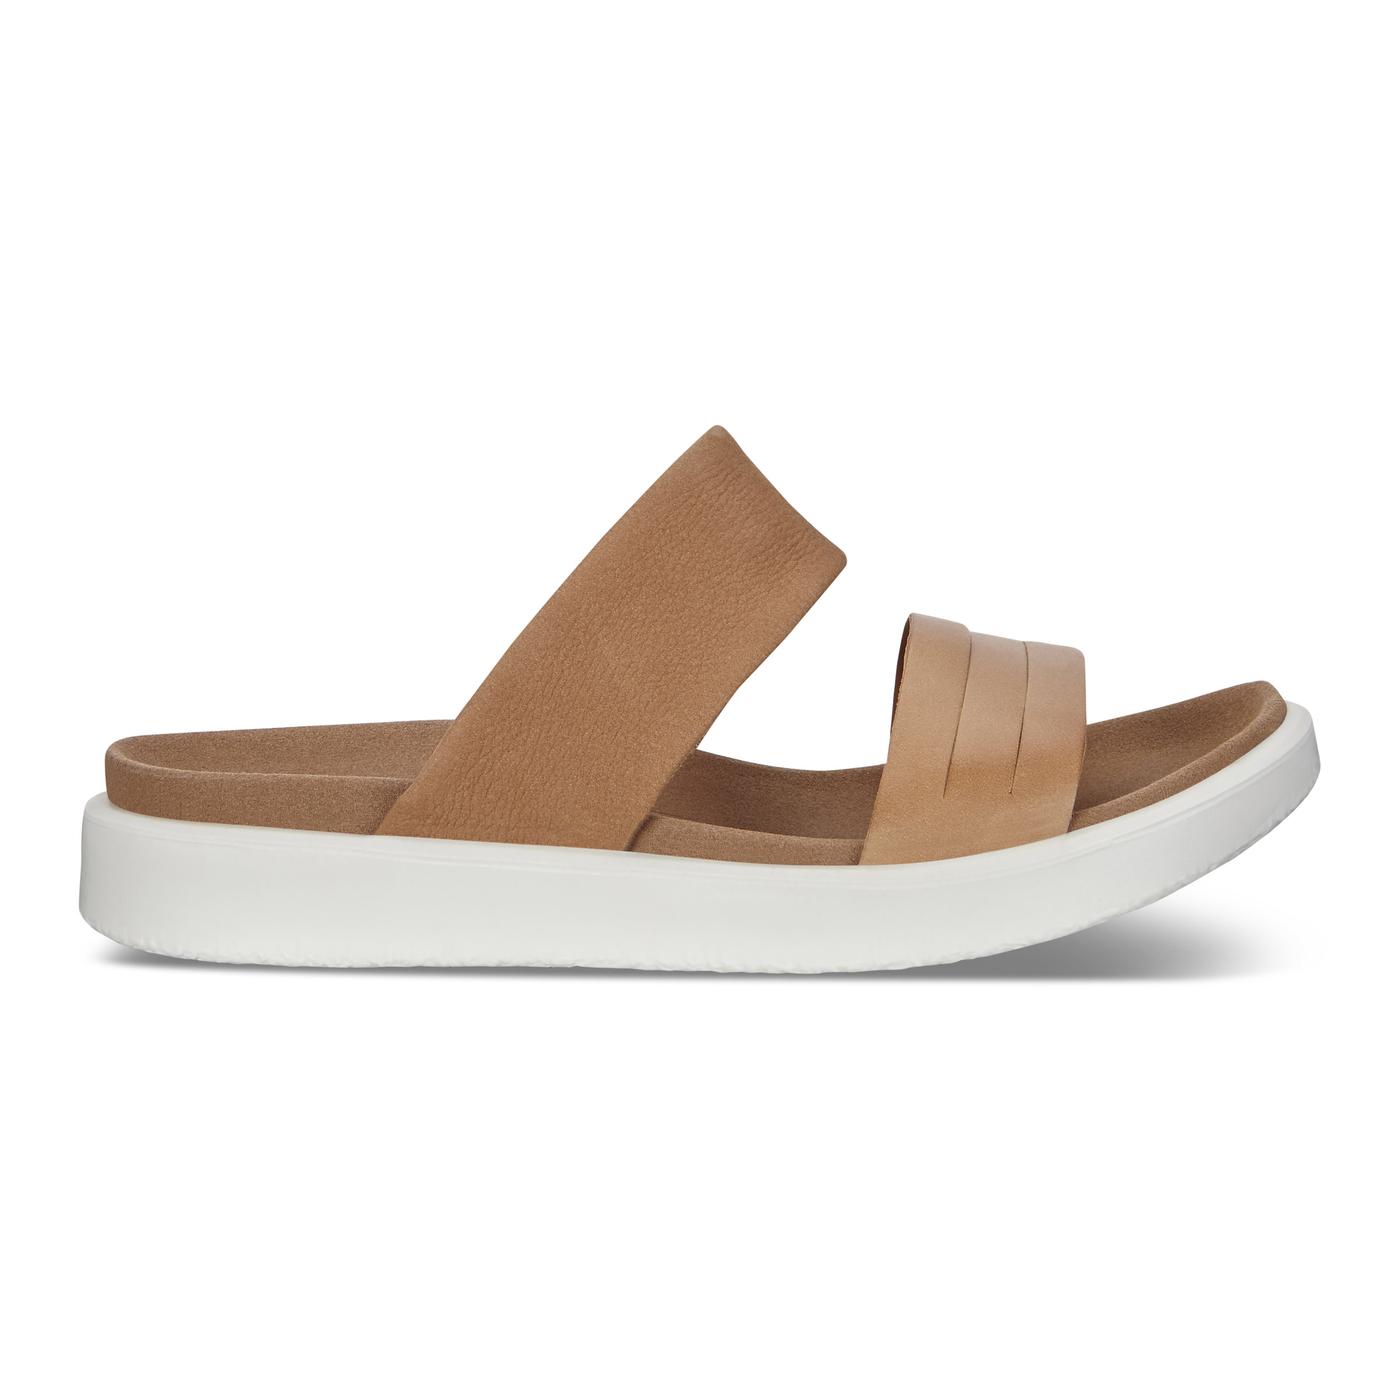 ECCO FLOWT Flat Sandal